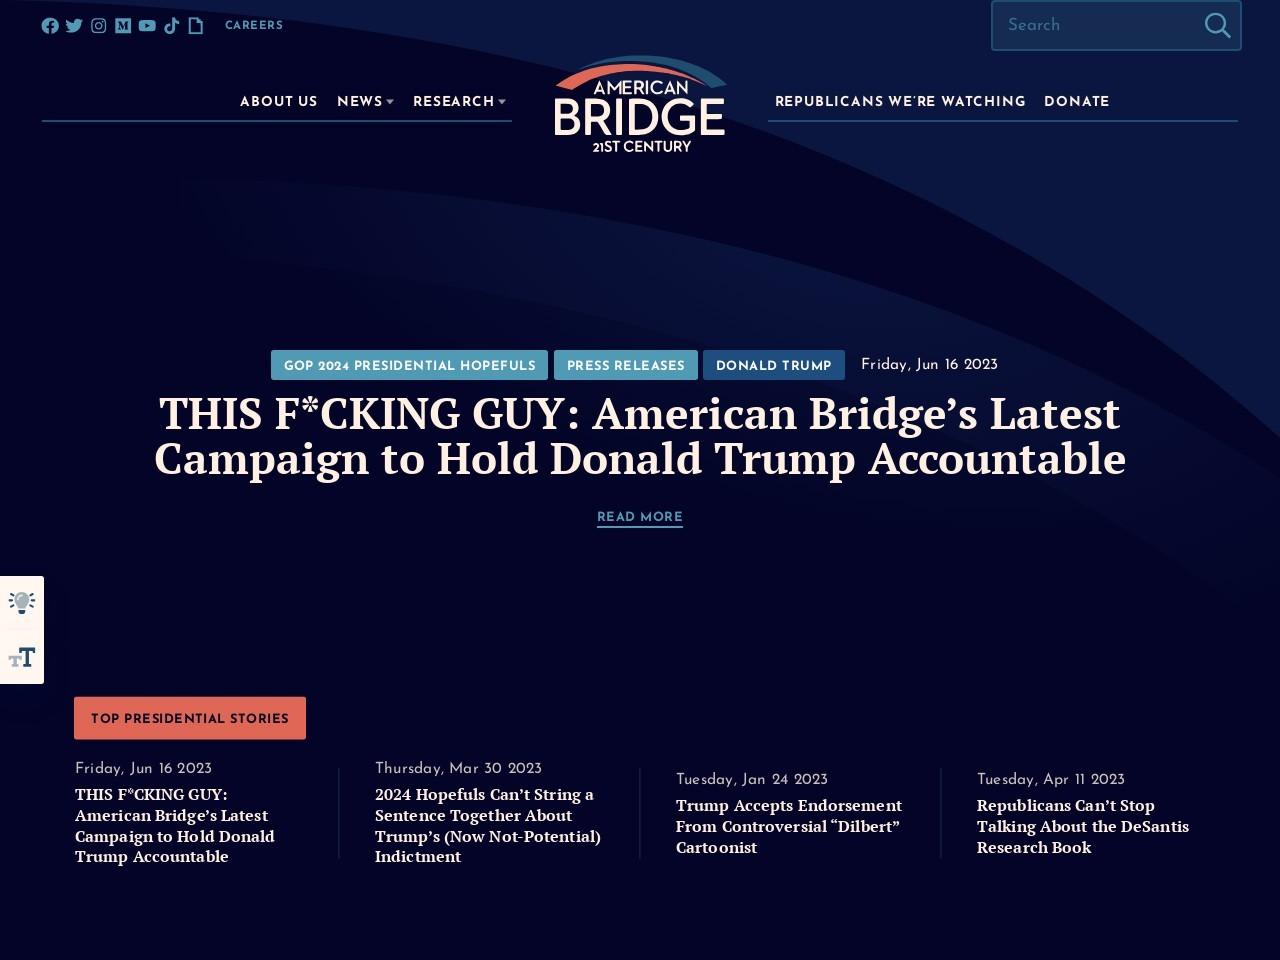 americanbridgepac.org